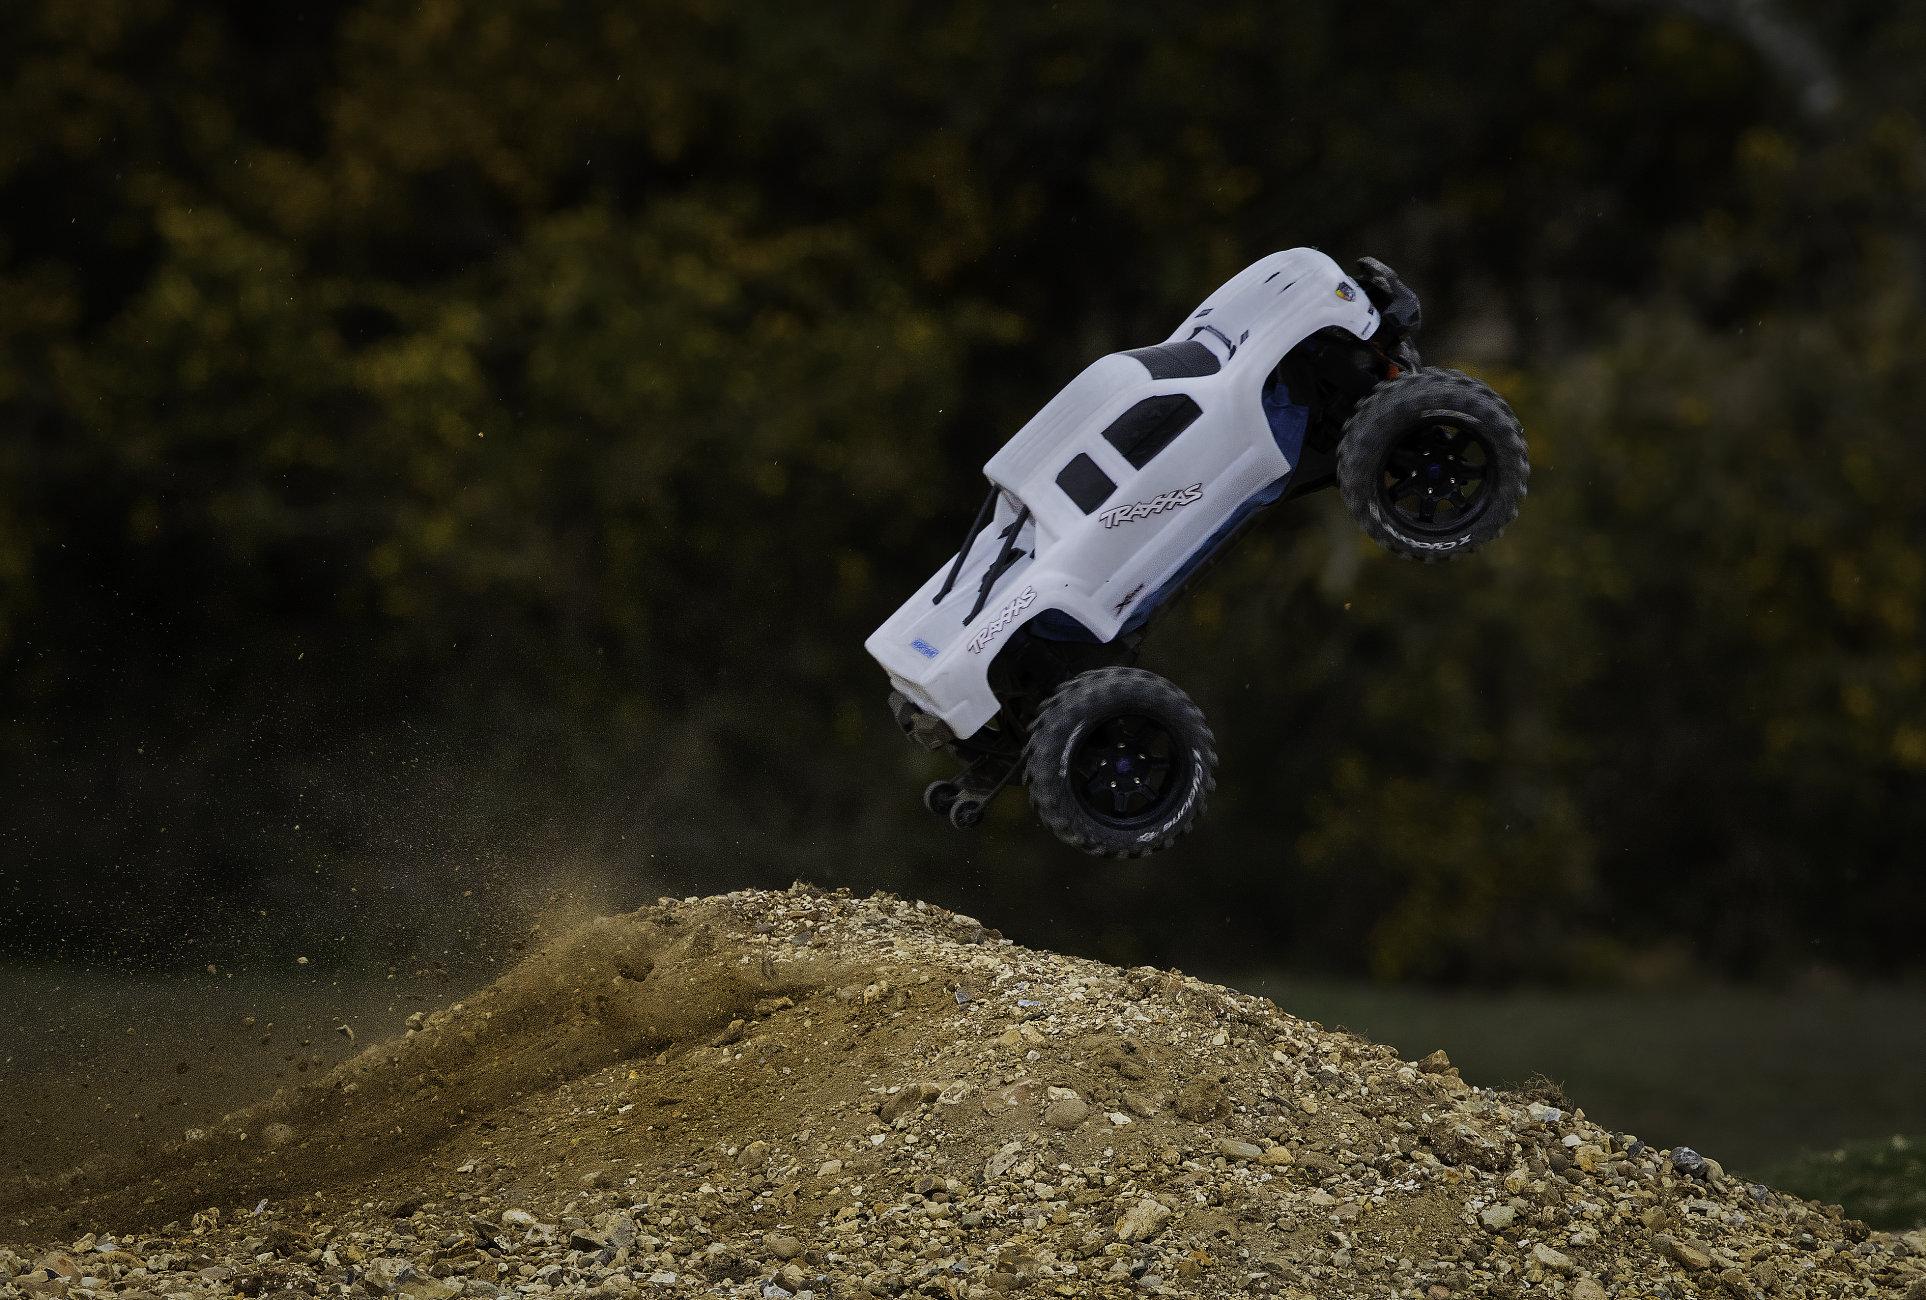 Truck jump